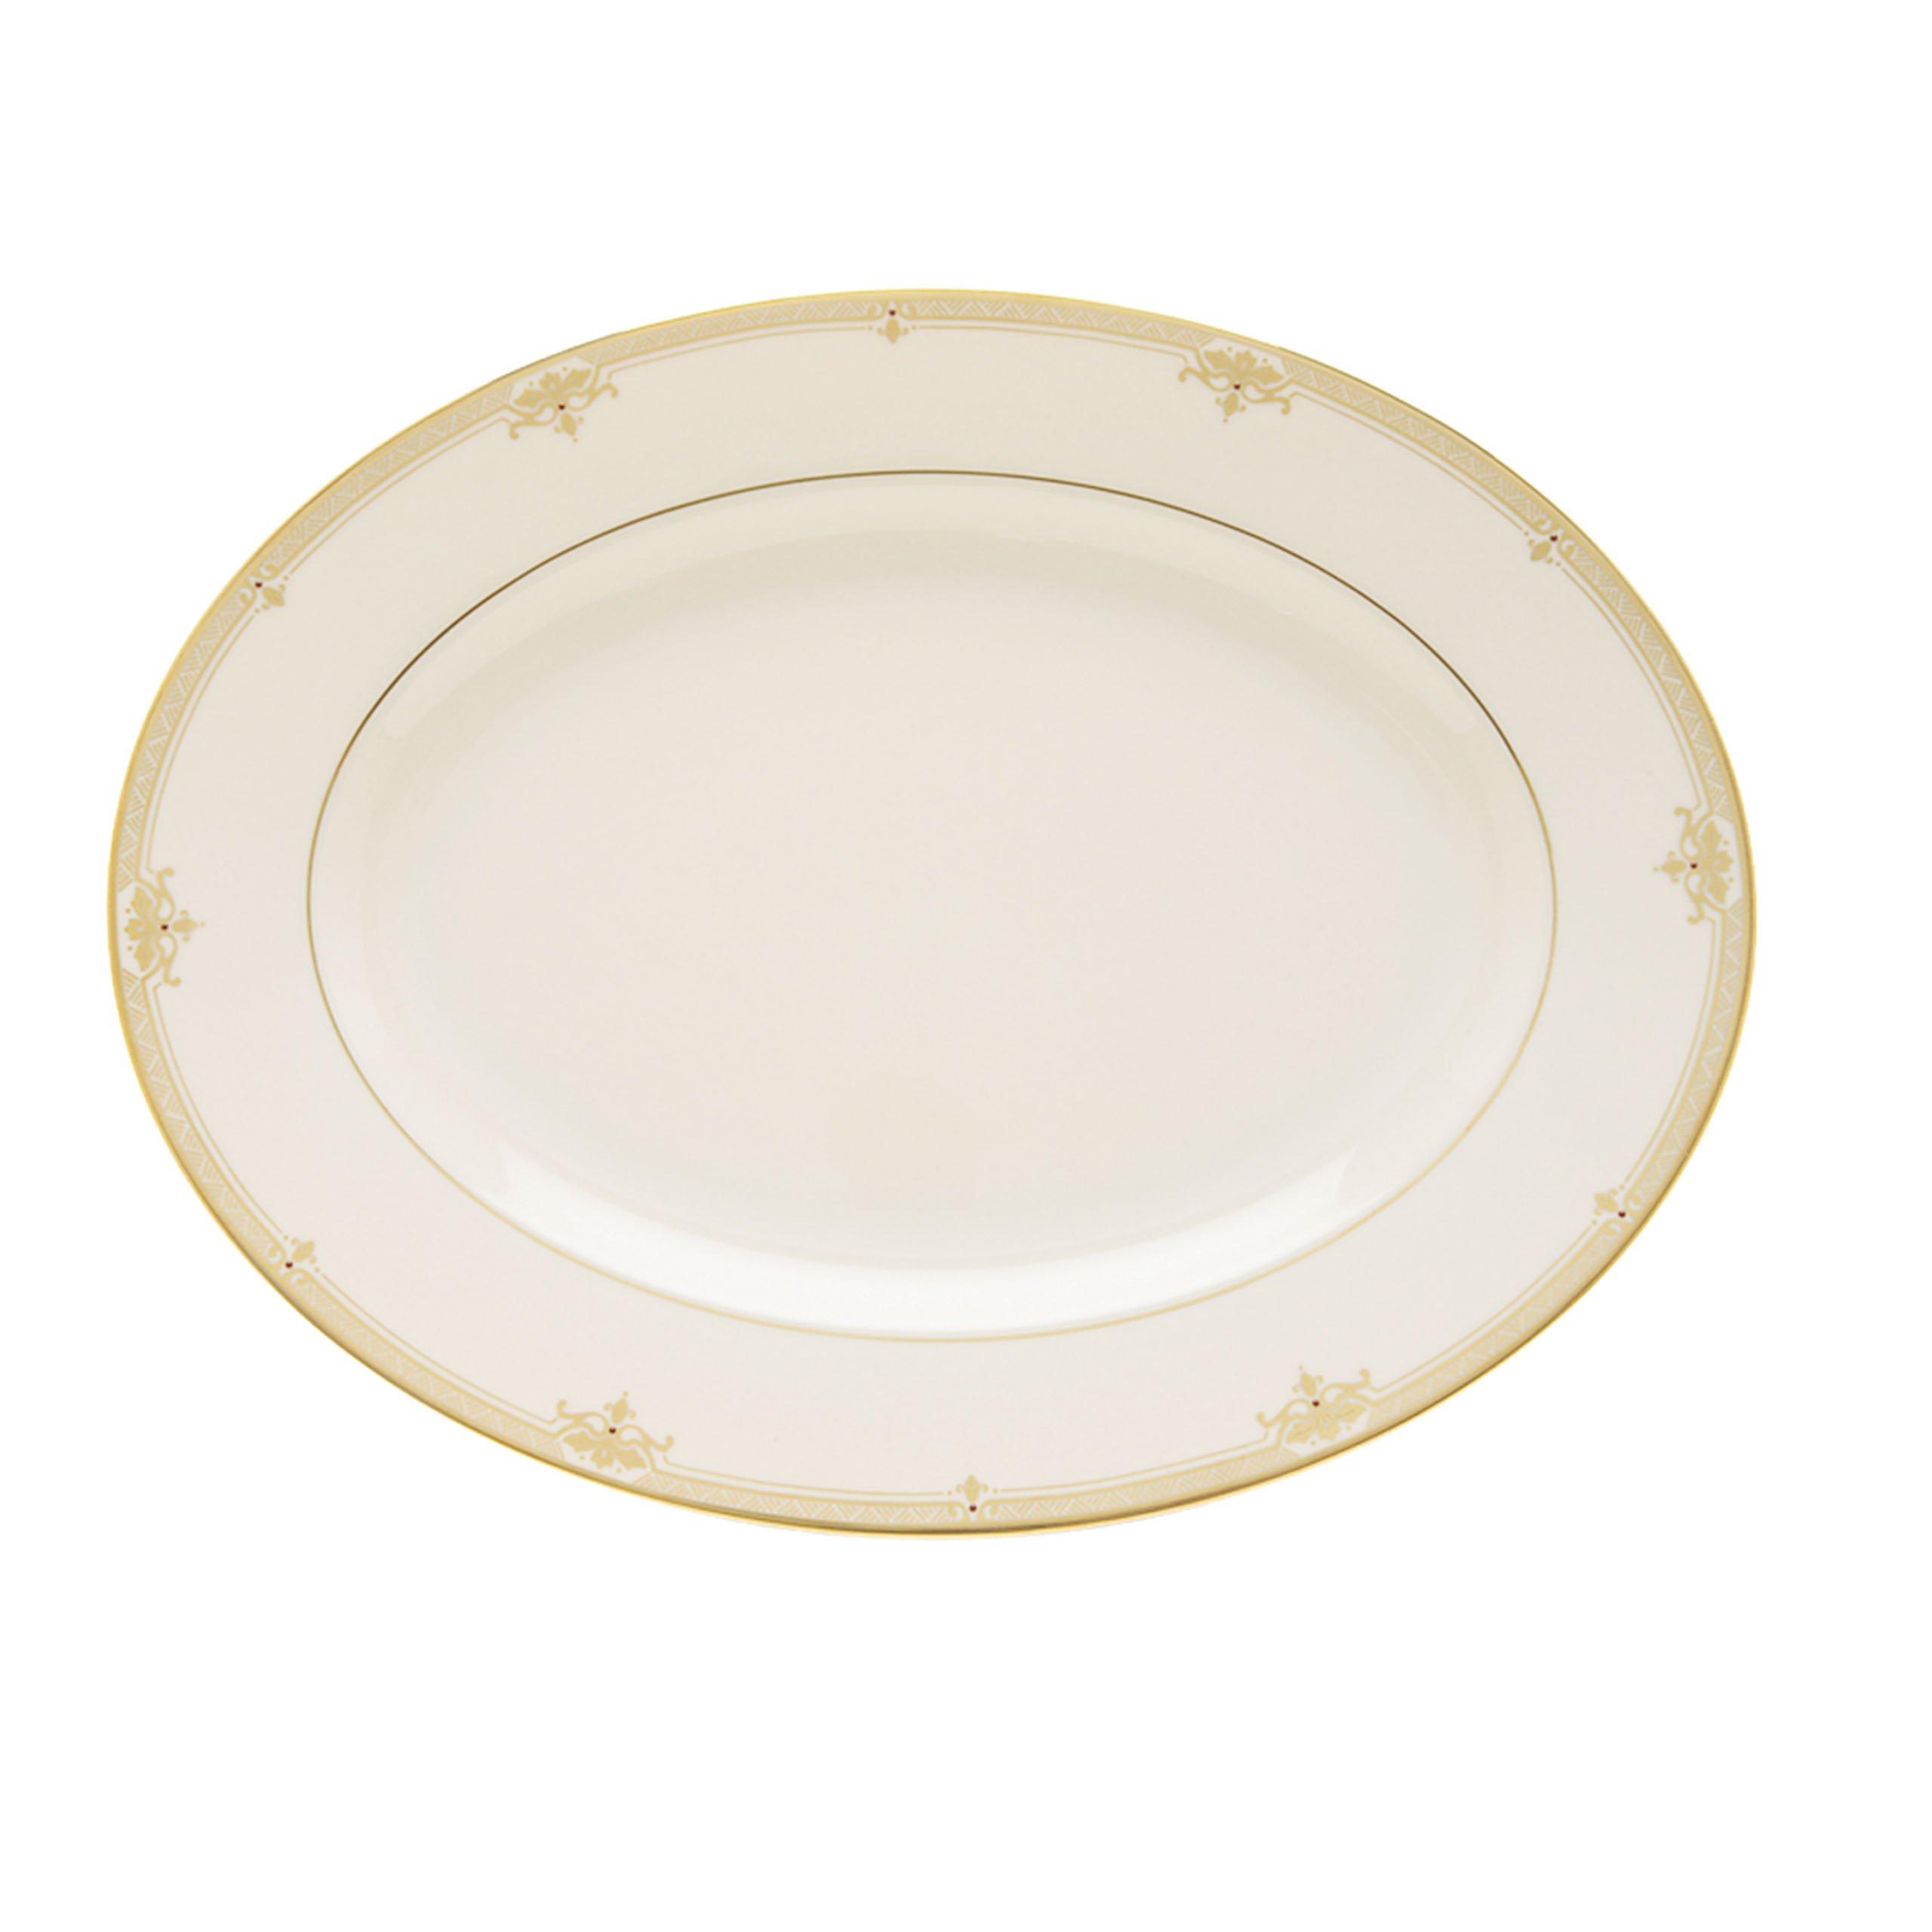 "Lenox 6044838 Republic 16"" Oval Serving Platter, White"